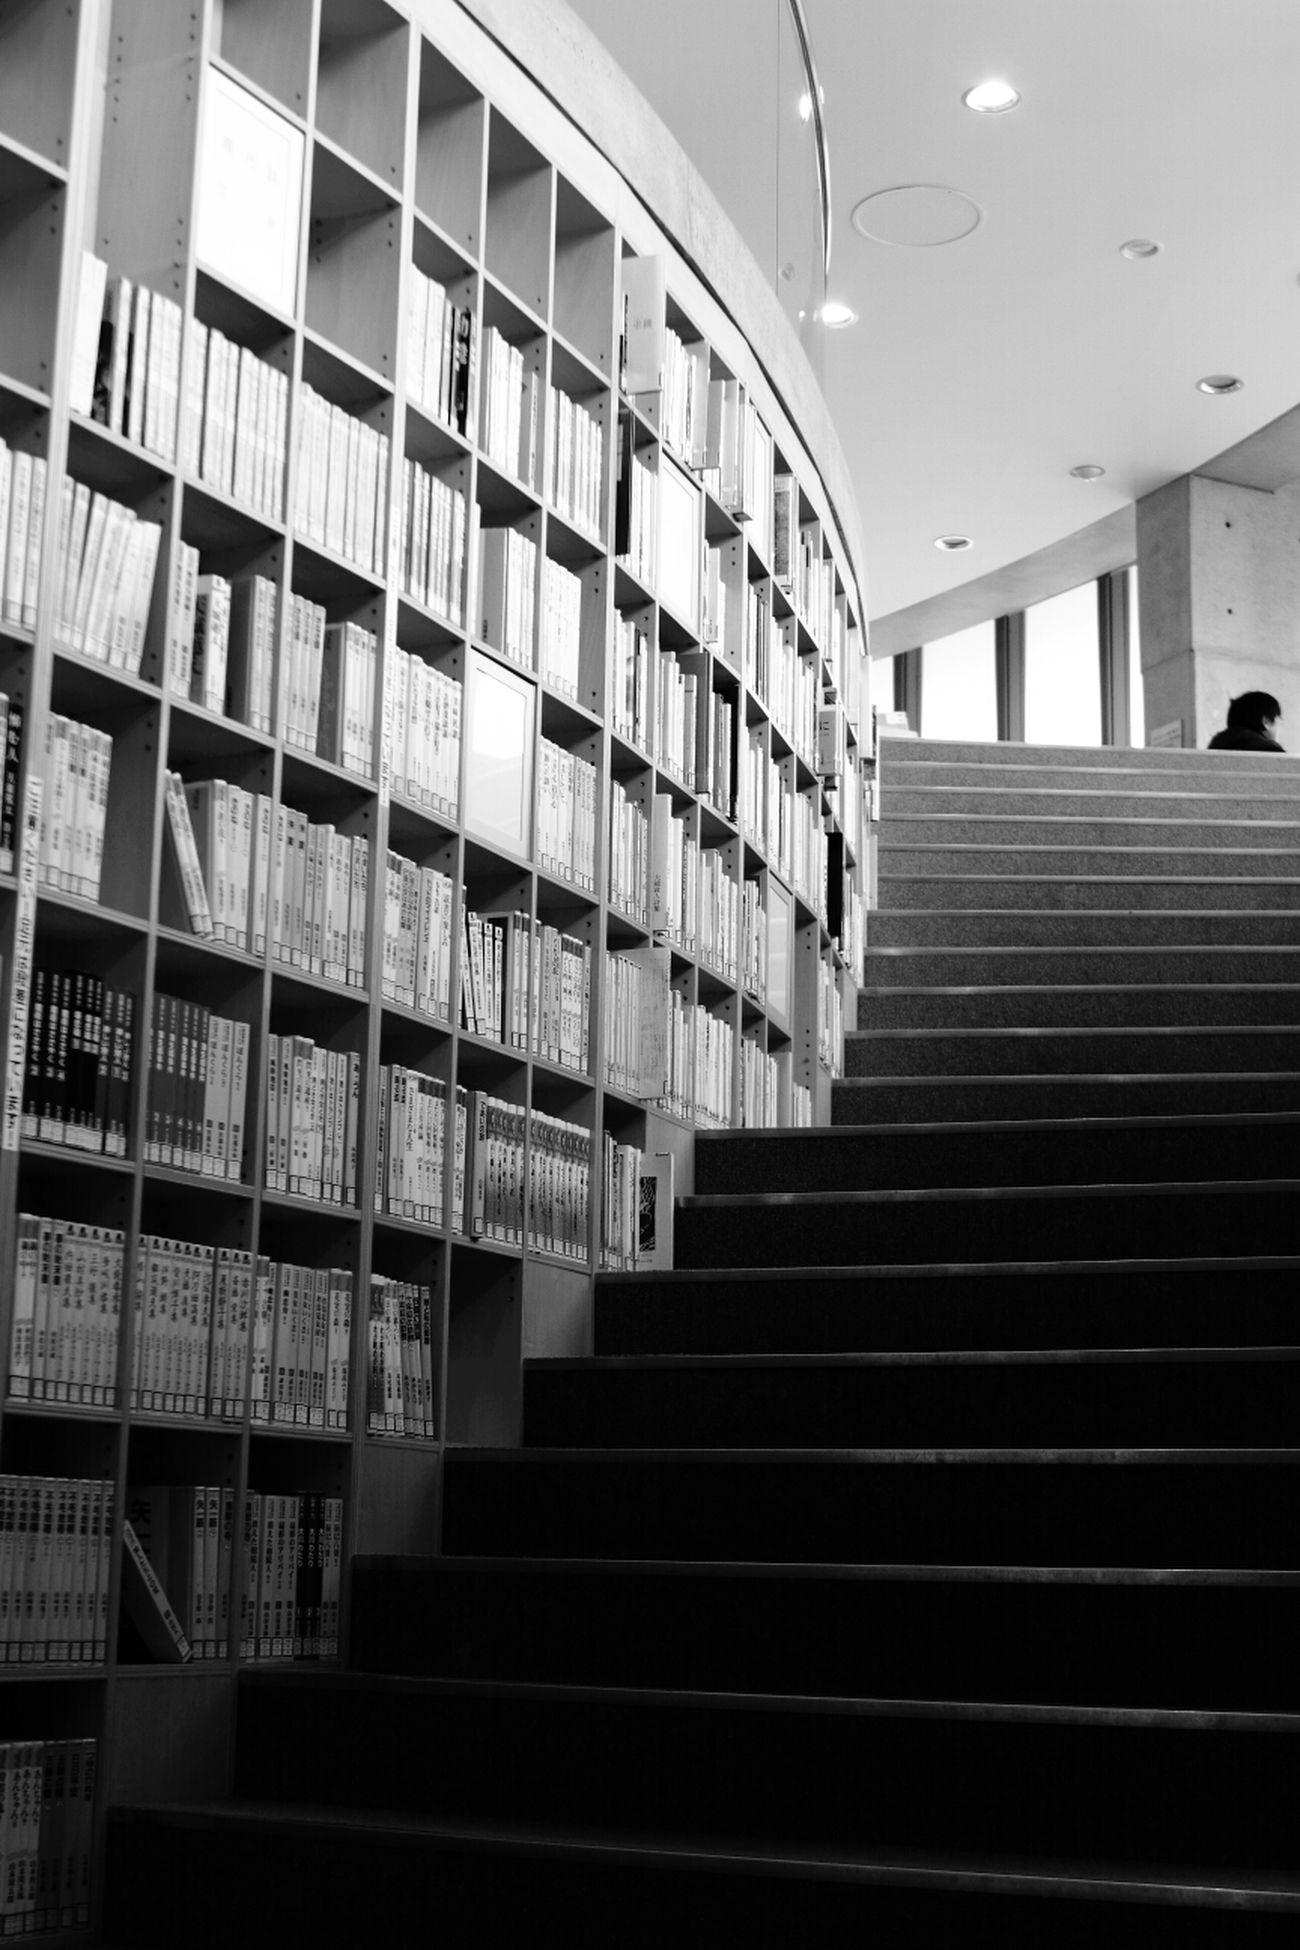 Books ♥ Taking Photos Taking Notes